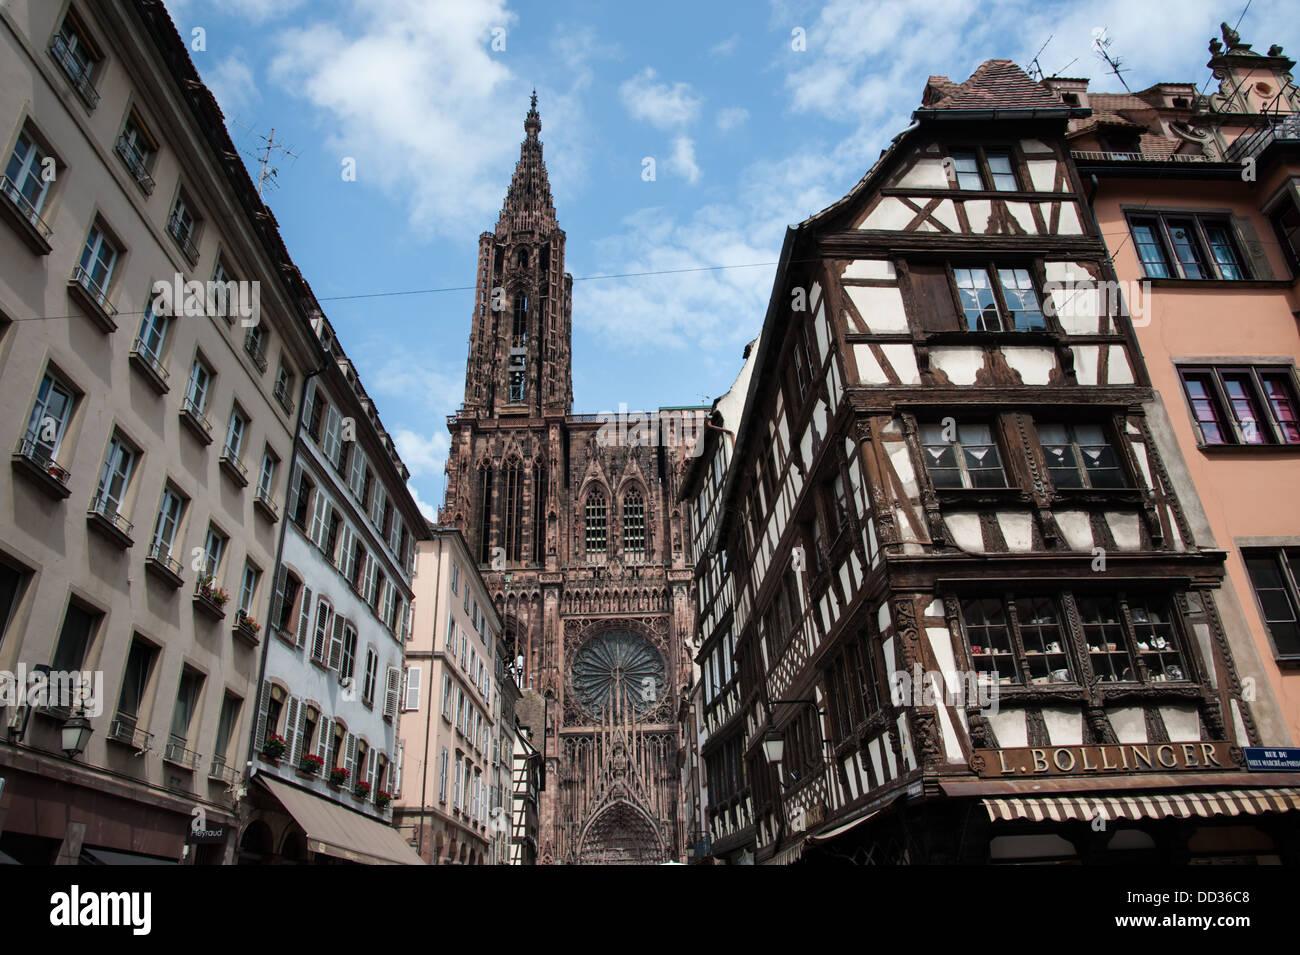 Strasbourg Cathedral, Strasbourg, France. - Stock Image